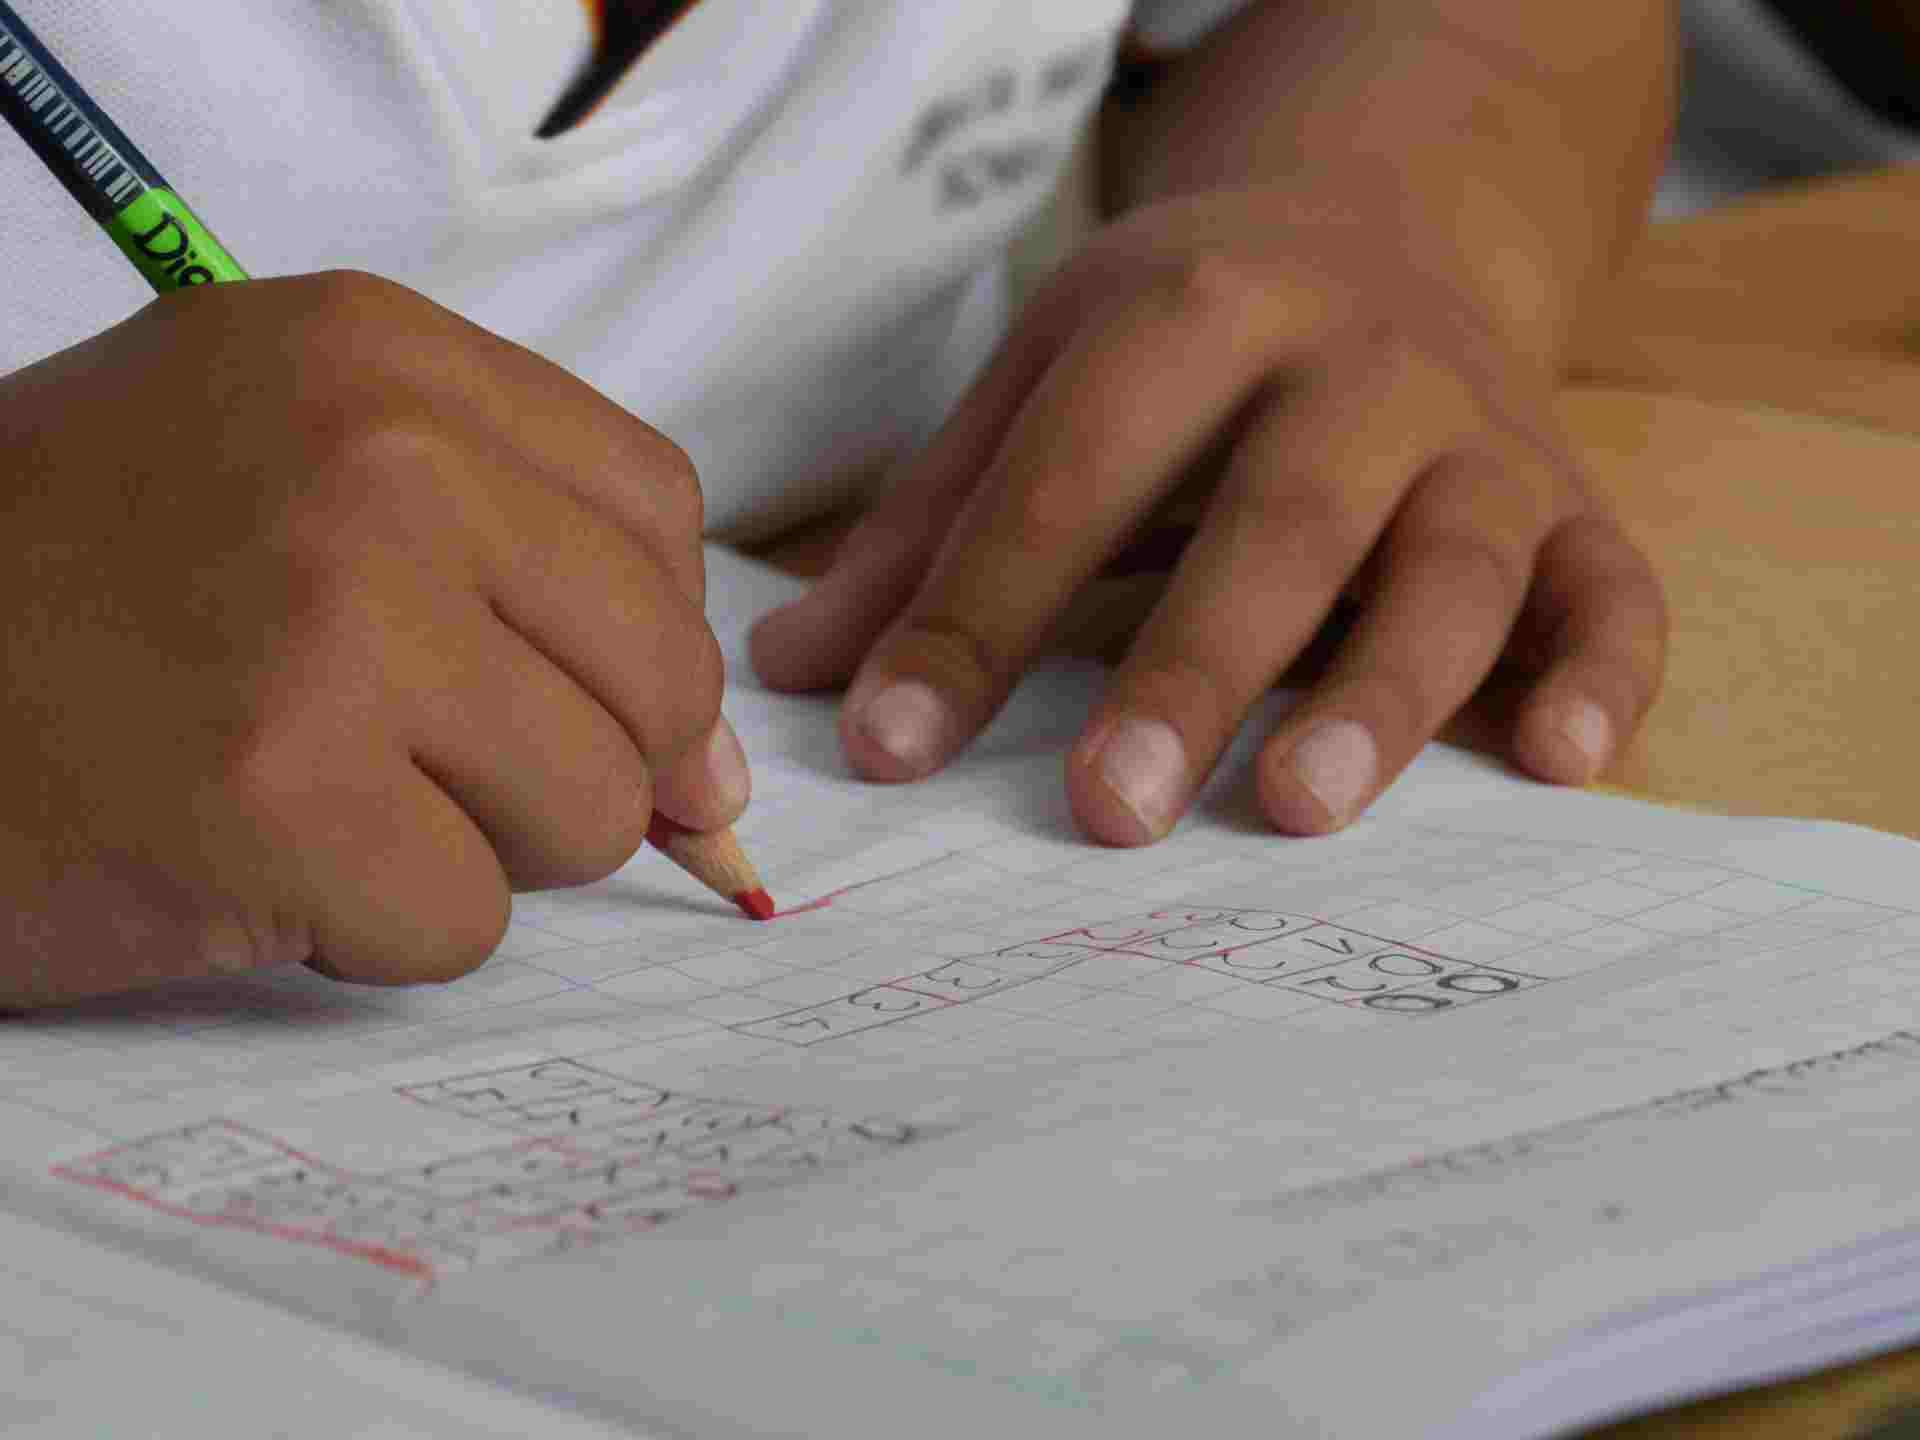 Smart custom essays complements math xl